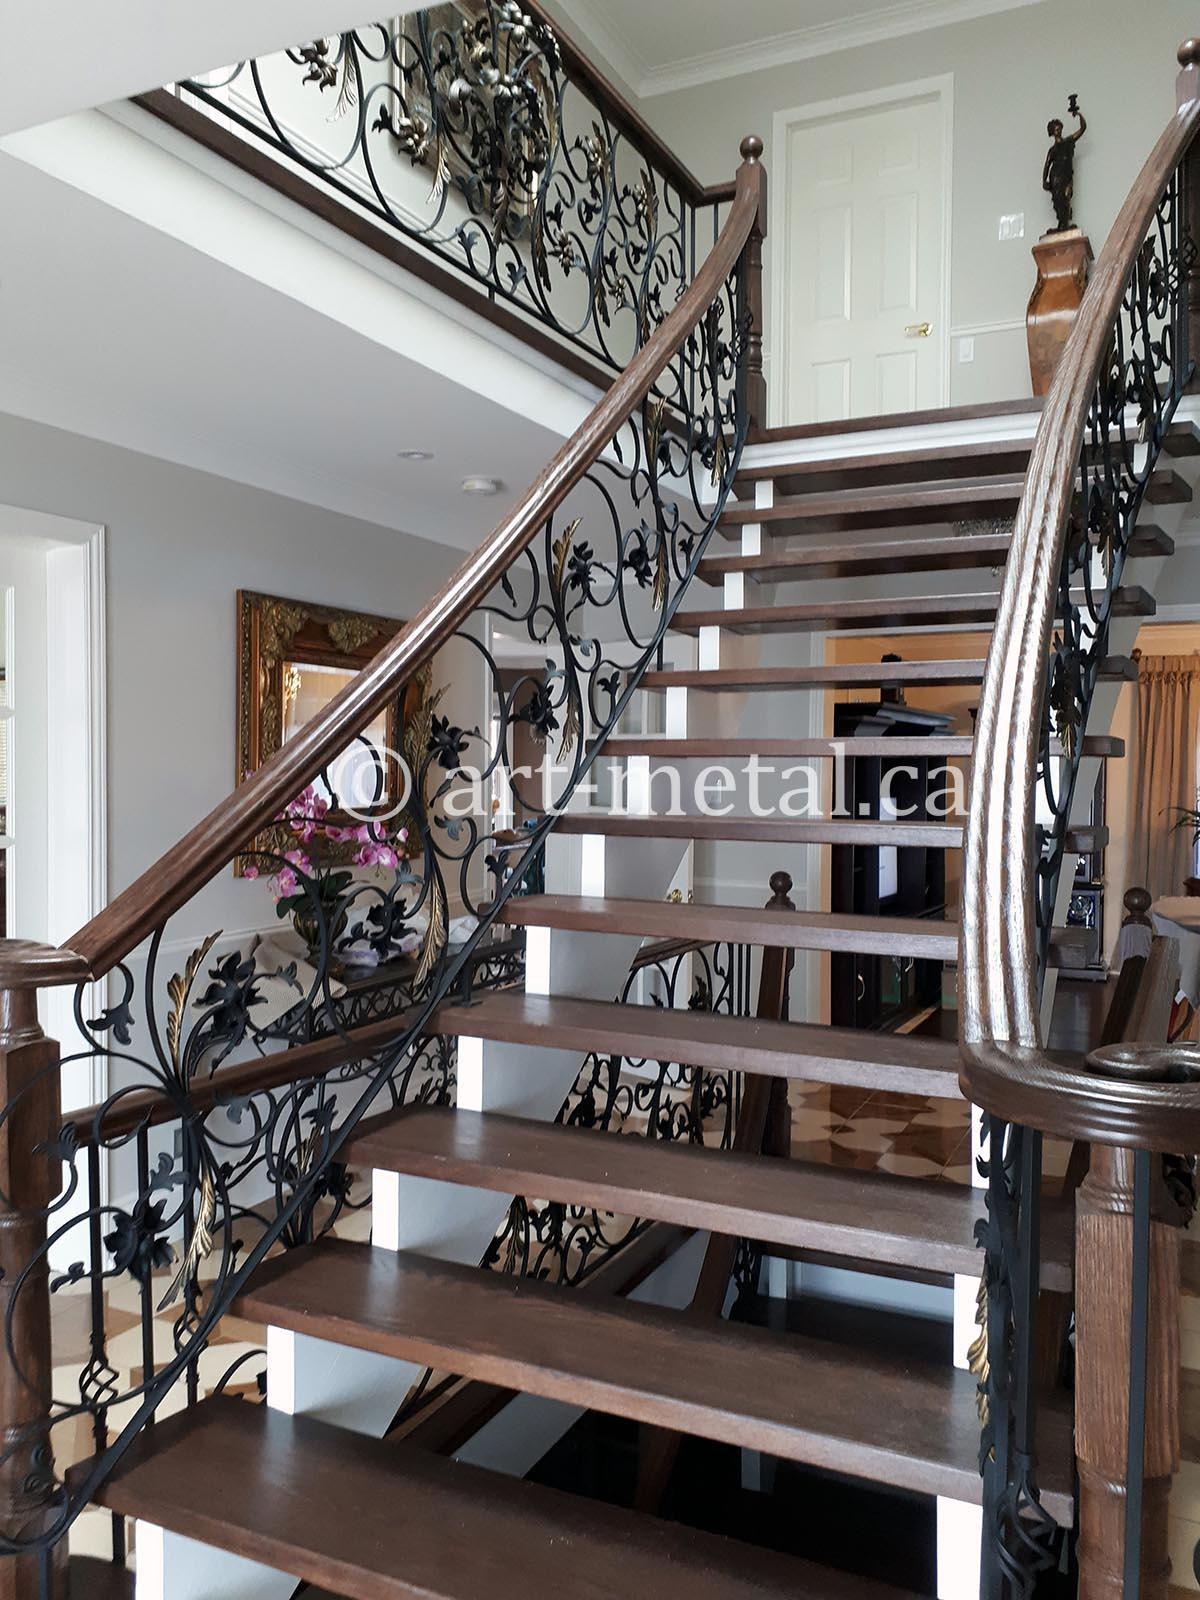 Get Best Wrought Iron Staircase Designs Ideas In Toronto   Wrought Iron Handrail Designs   Staircase   Iron Pipe   Cast Iron Railing   Garden   Geometric Railing